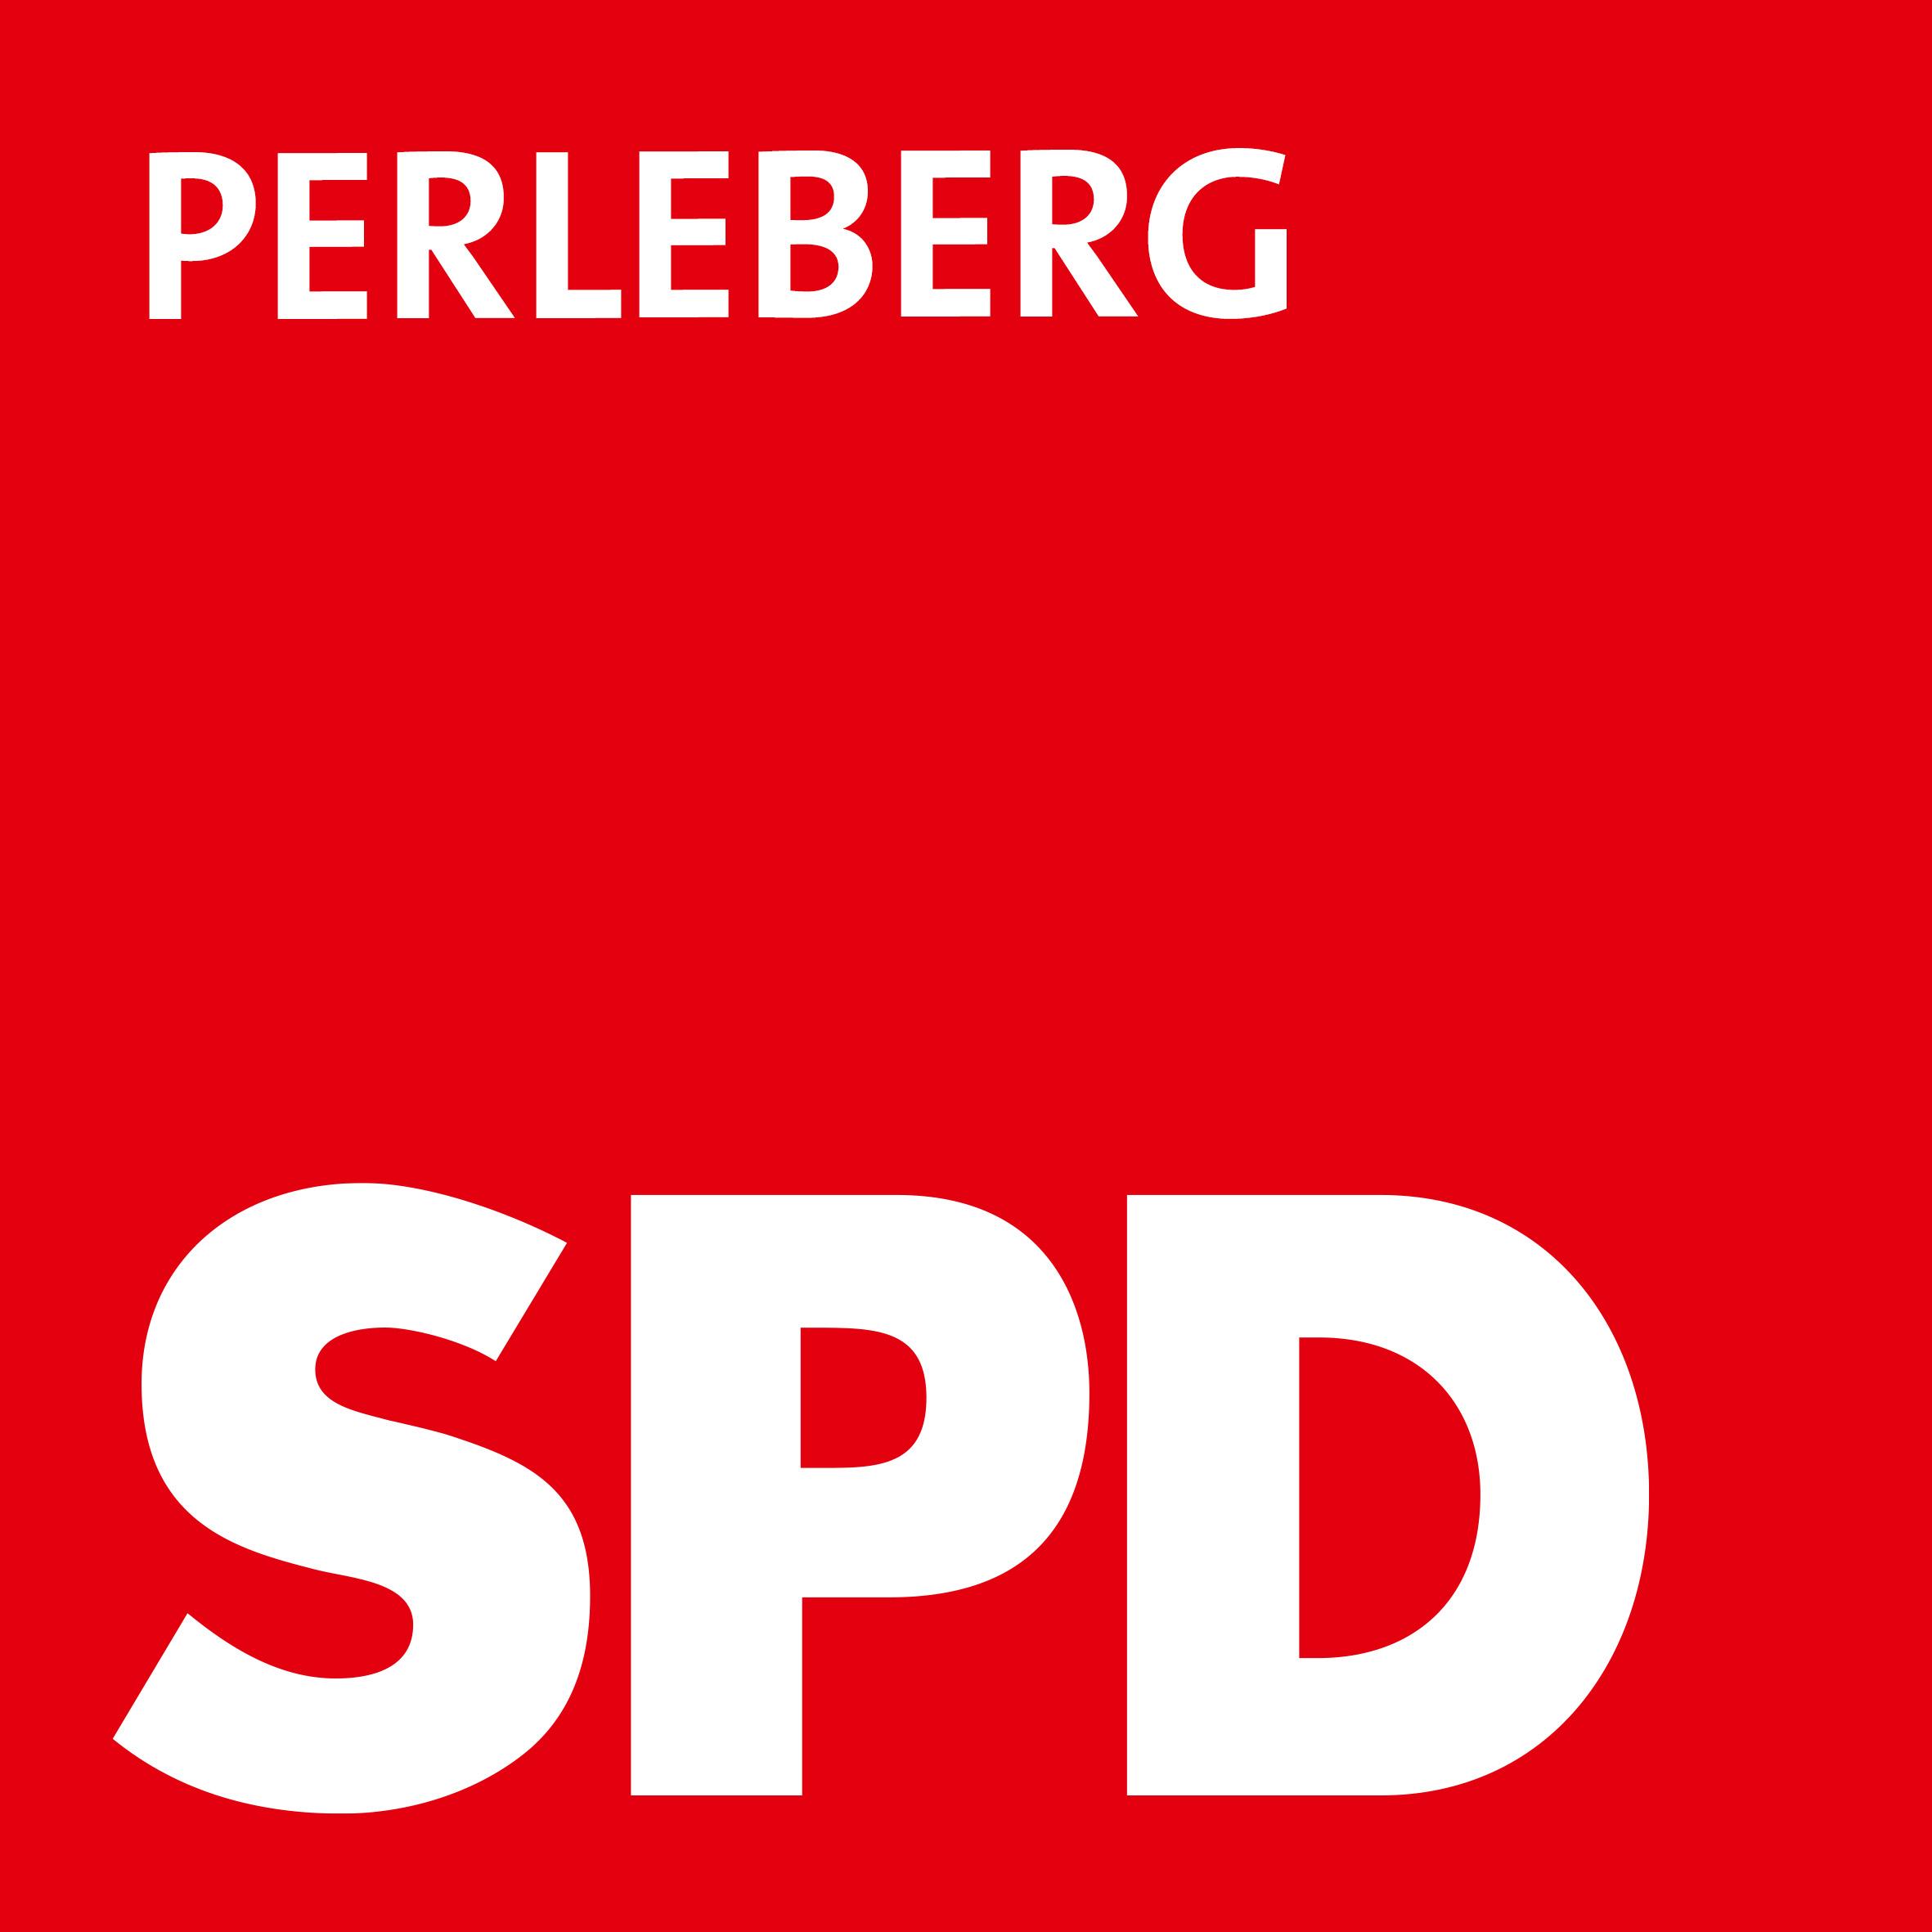 SPD Perleberg